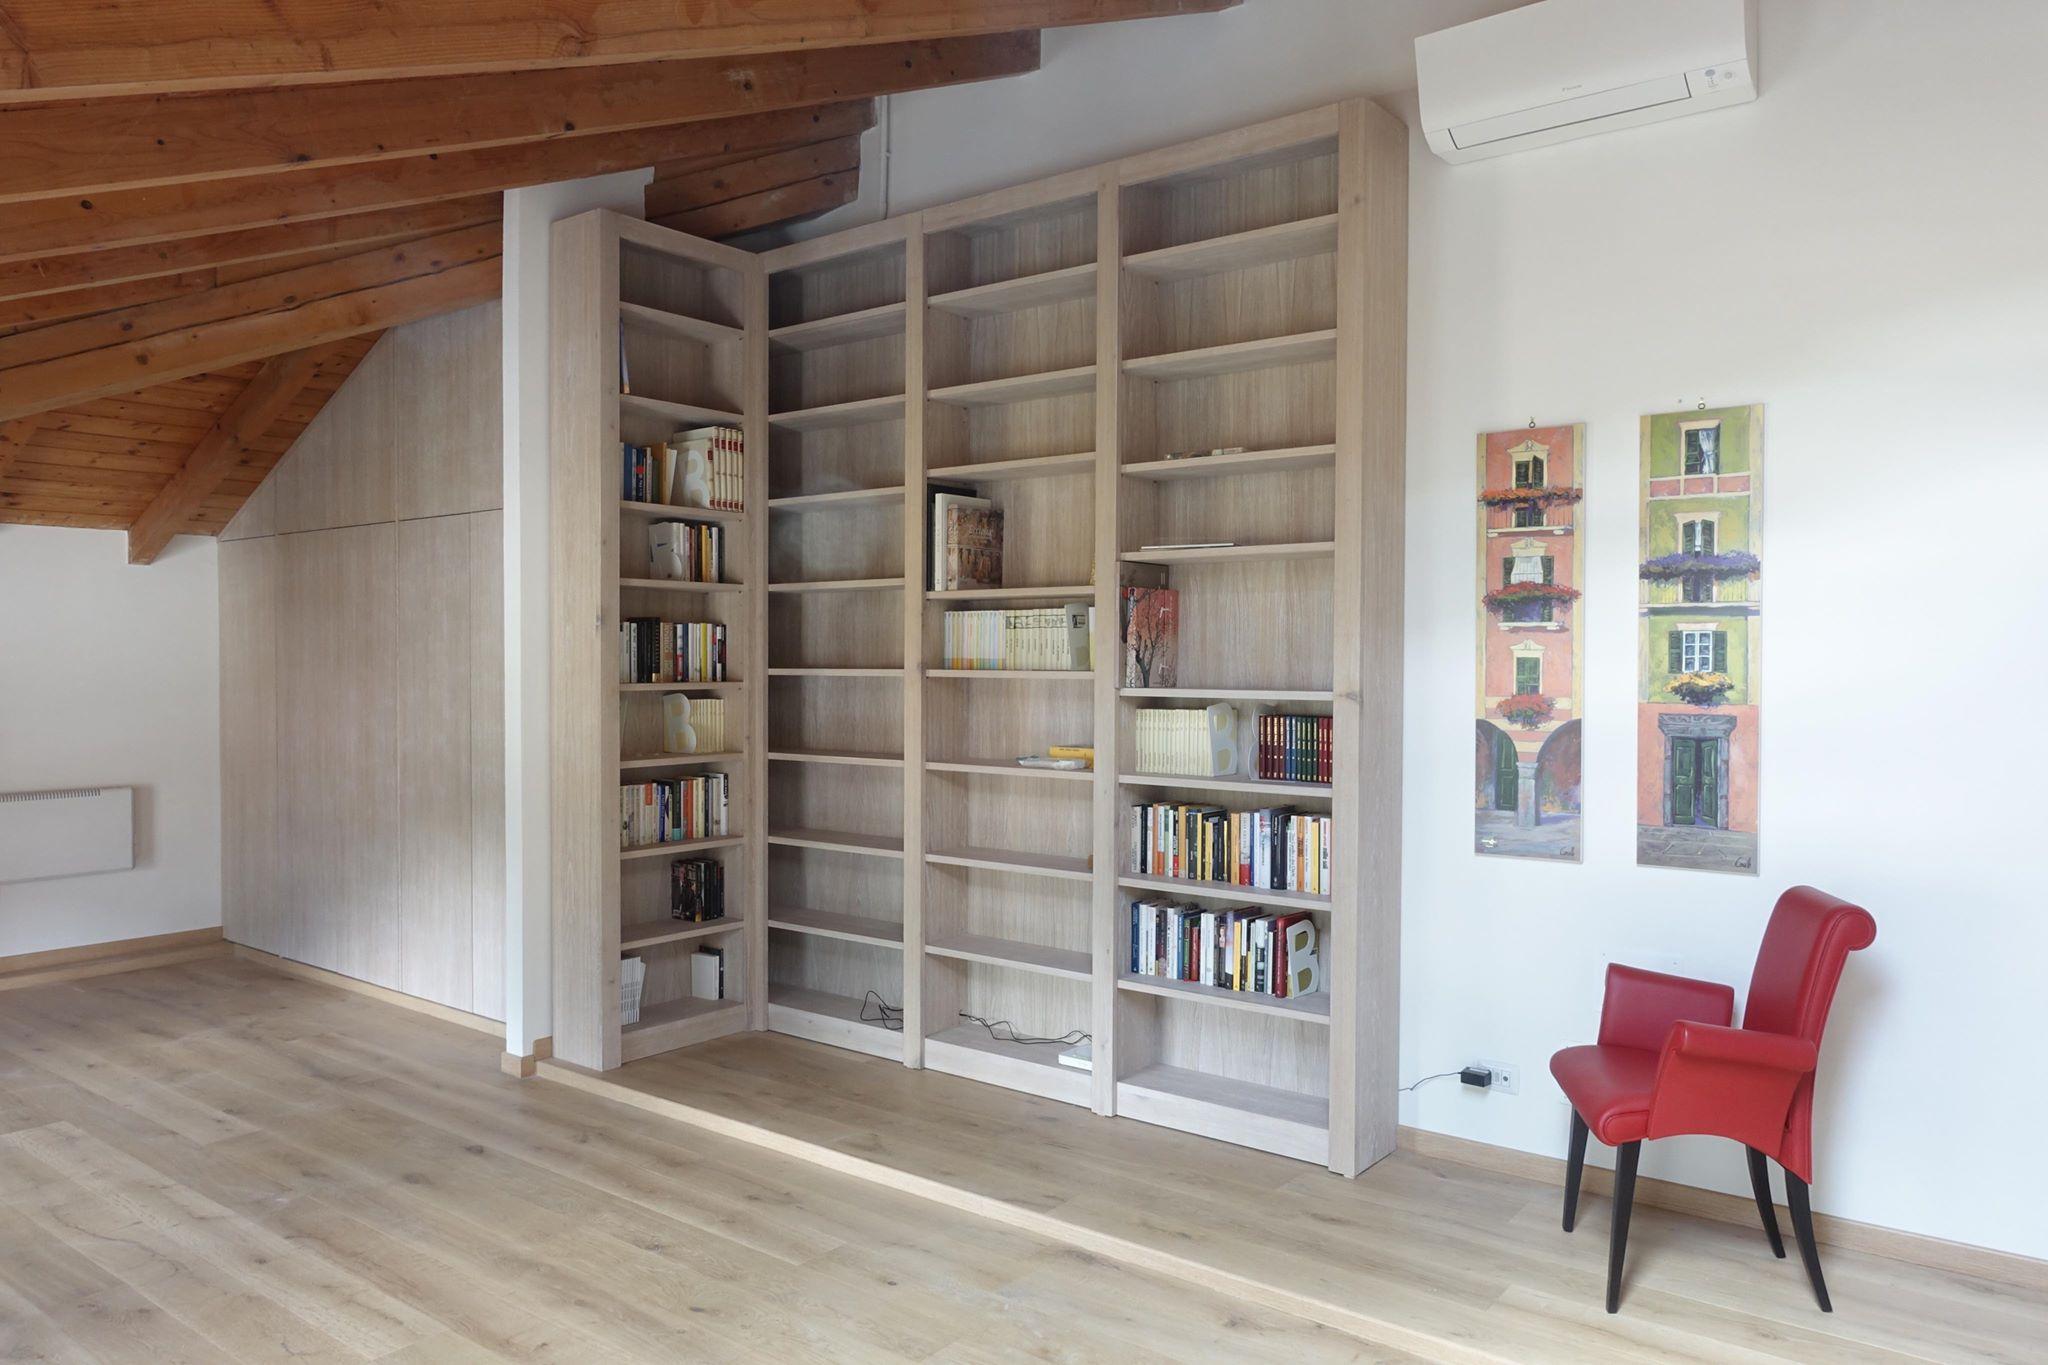 Armadio e libreria soggiorno mansardato|mansarda|lgnoeoltre